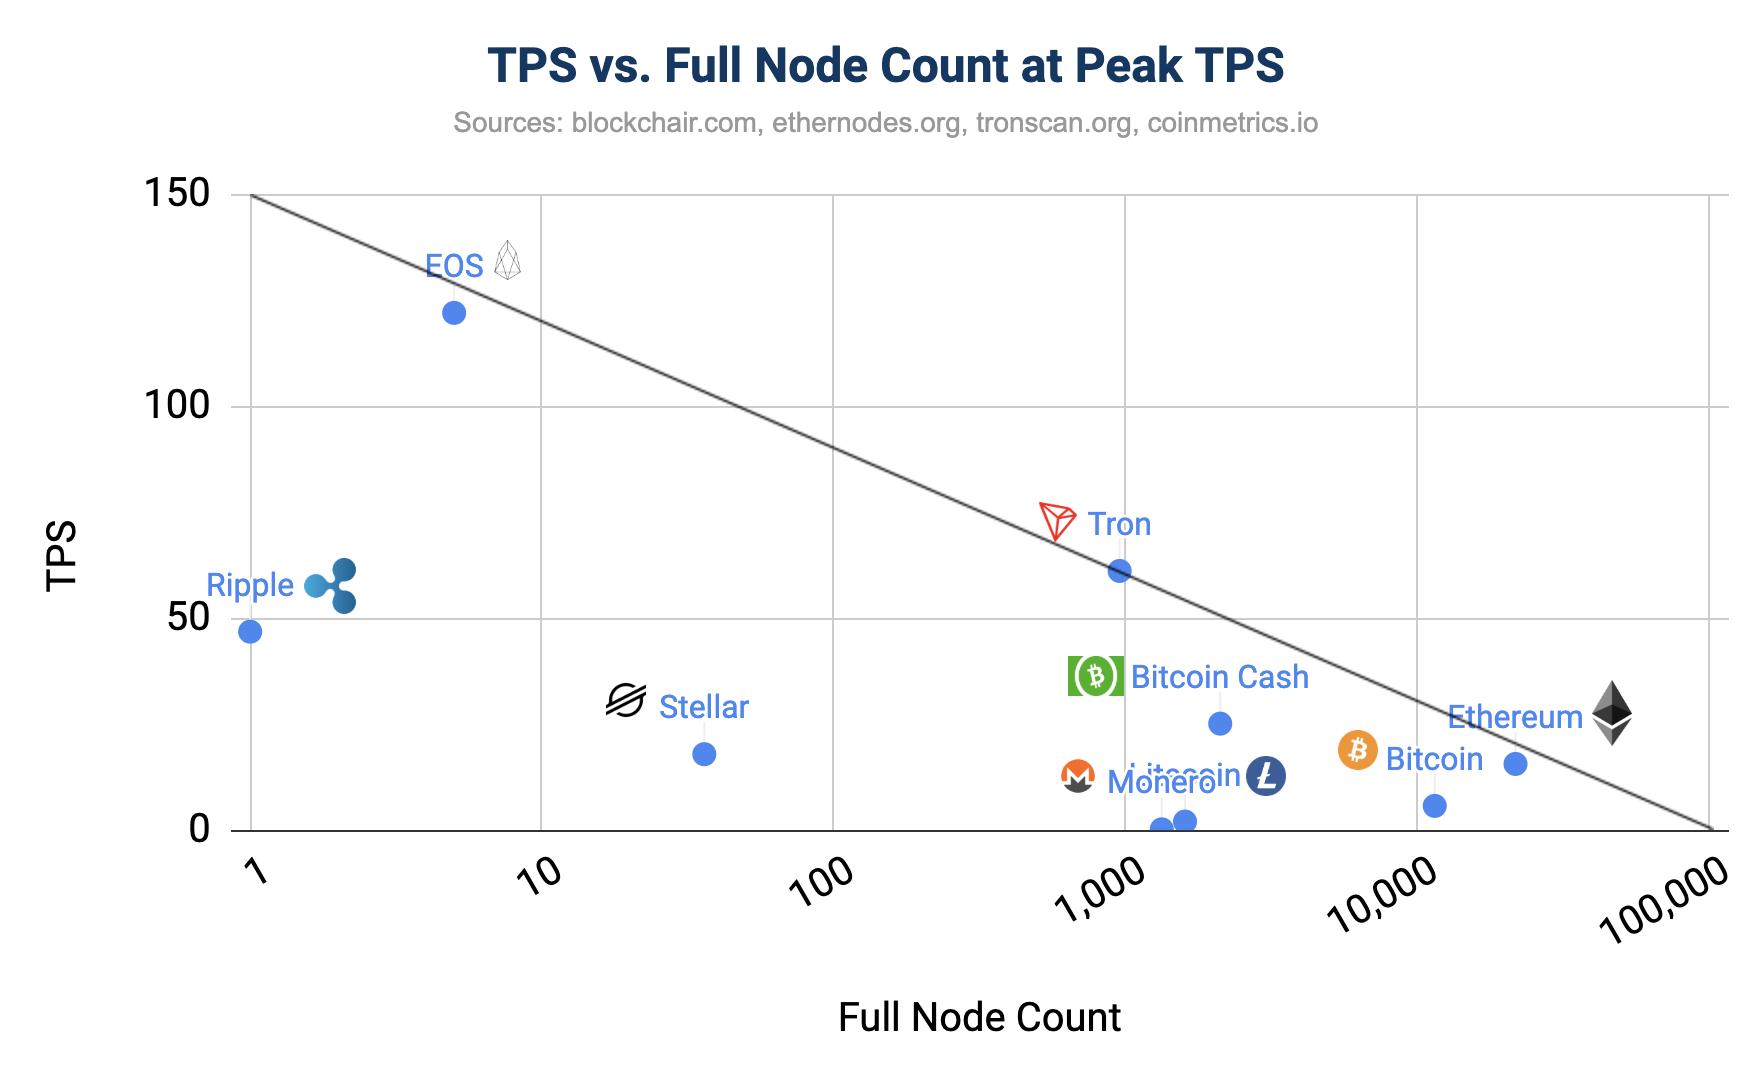 TPS vs. Full Node Count at Peak TPS